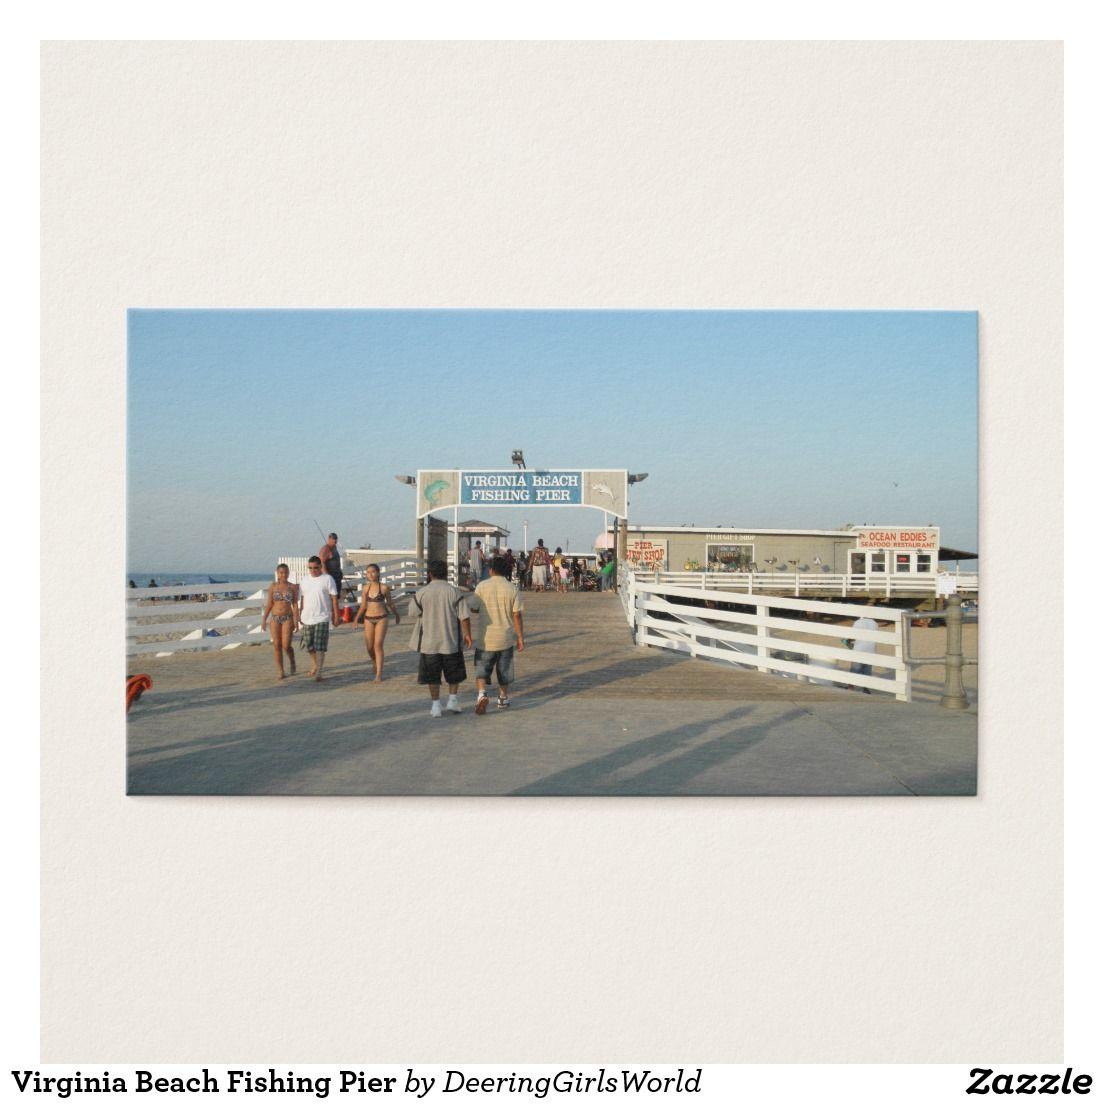 Virginia Beach Fishing Pier Business Card | DeeringGirlsWorld ...